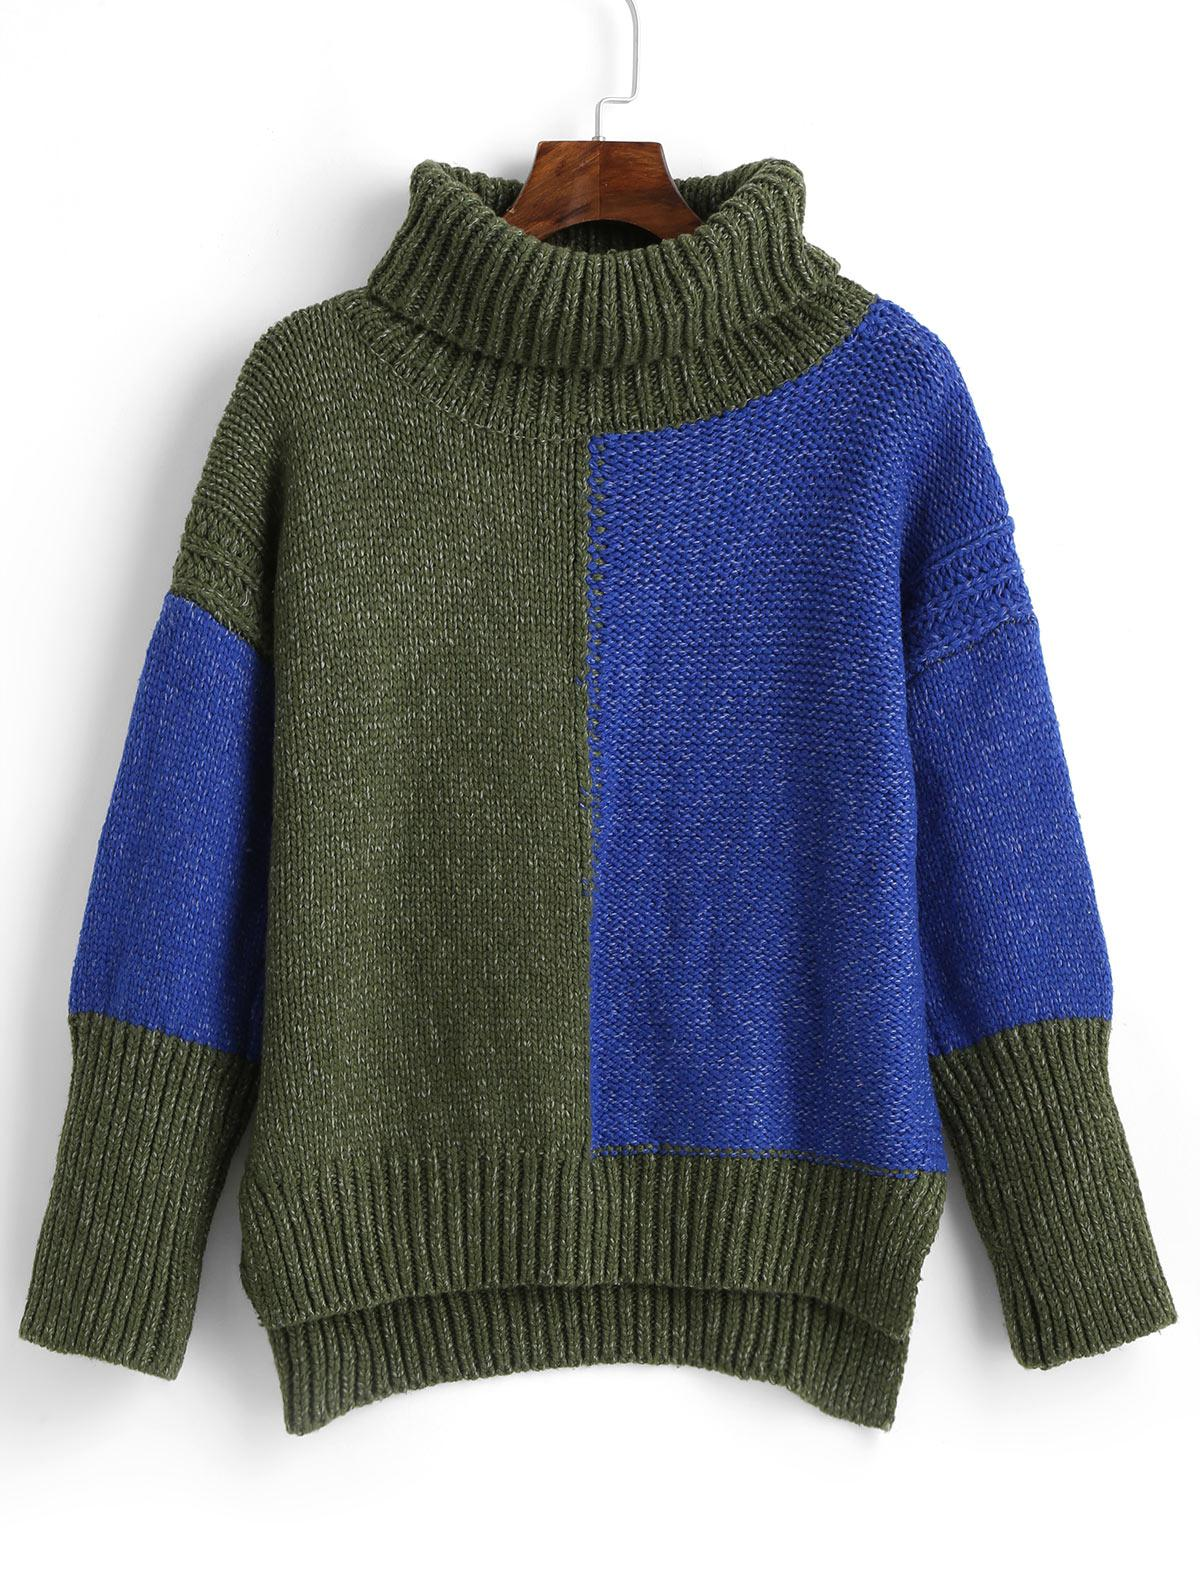 ZAFUL High Low Color Block Turtleneck Sweater